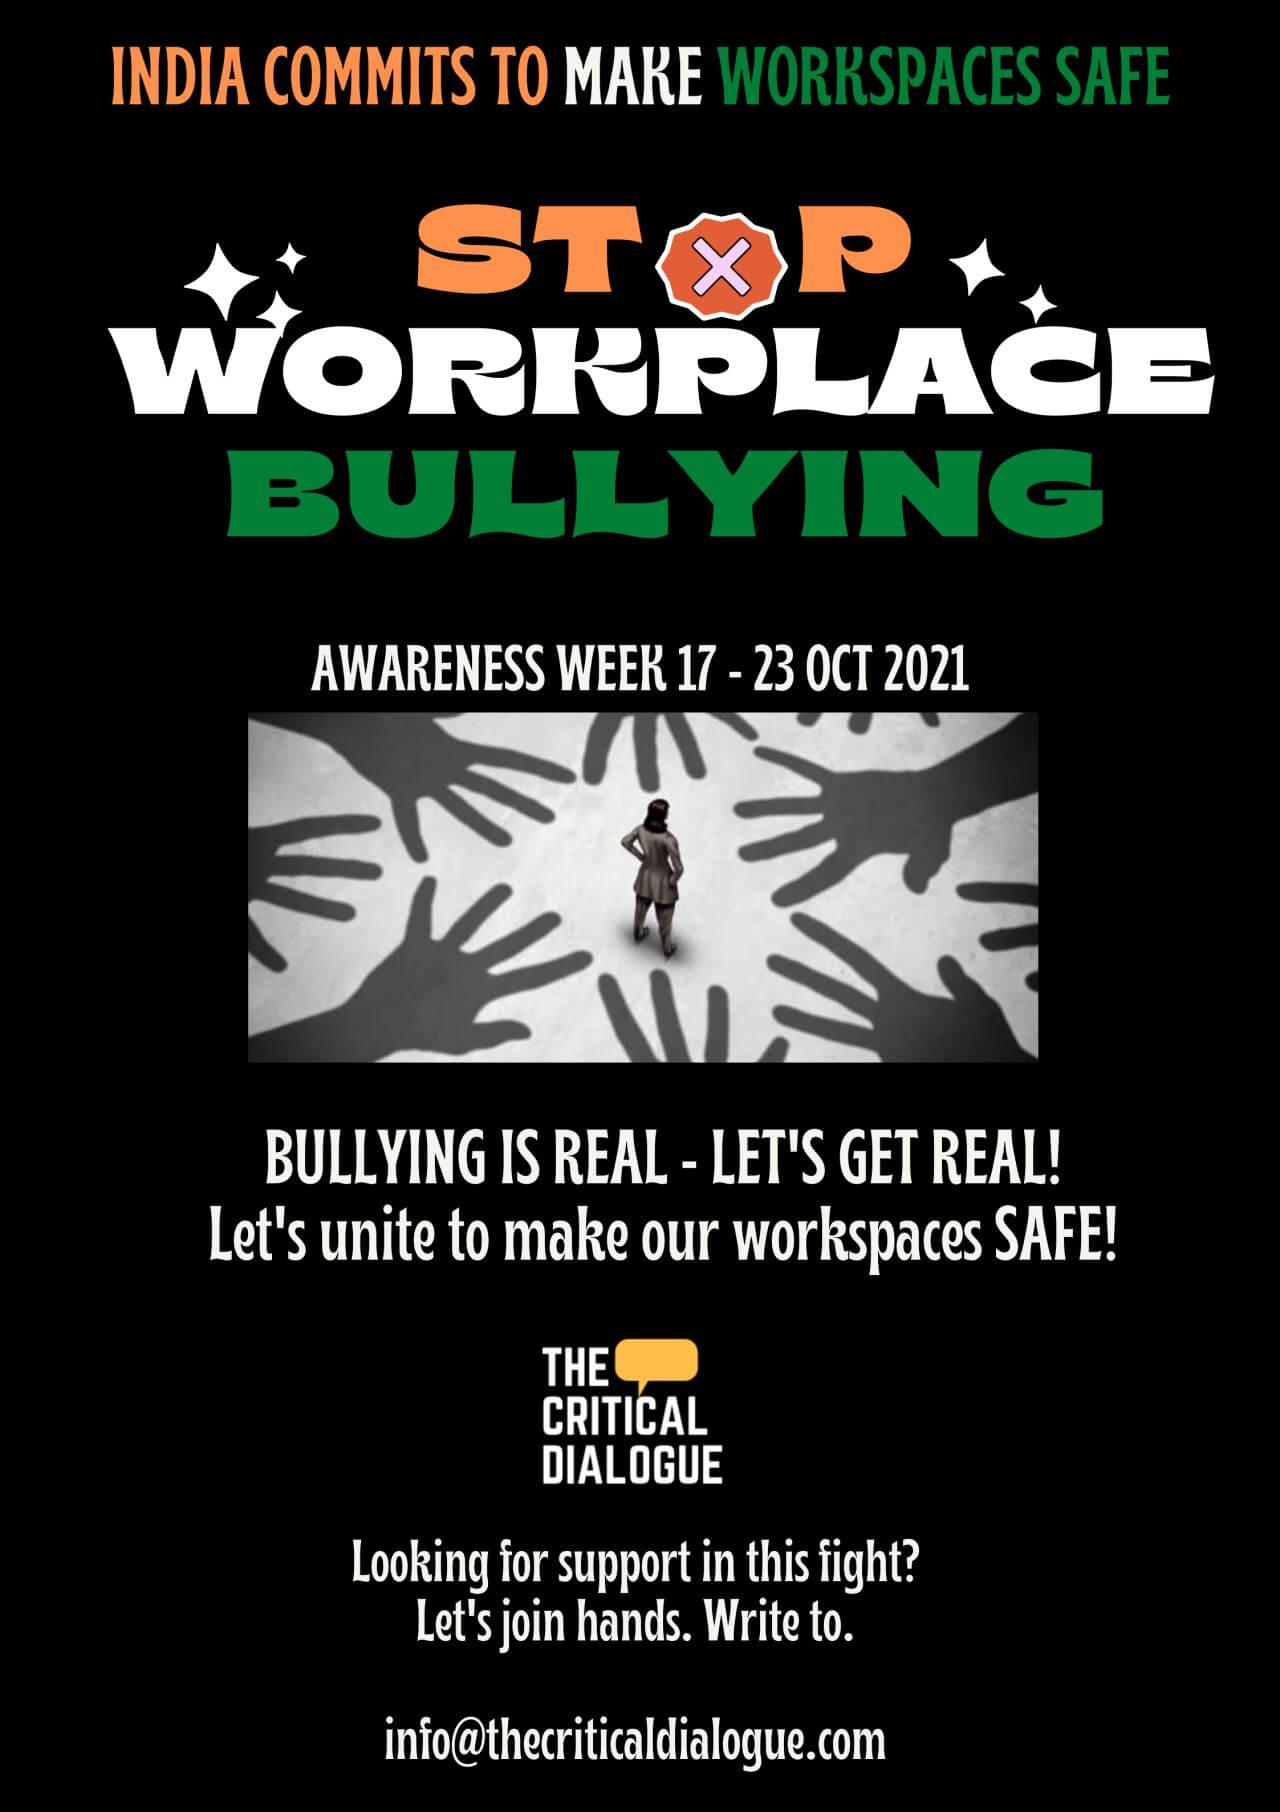 Workplace Bullying Awareness Week 2021, India